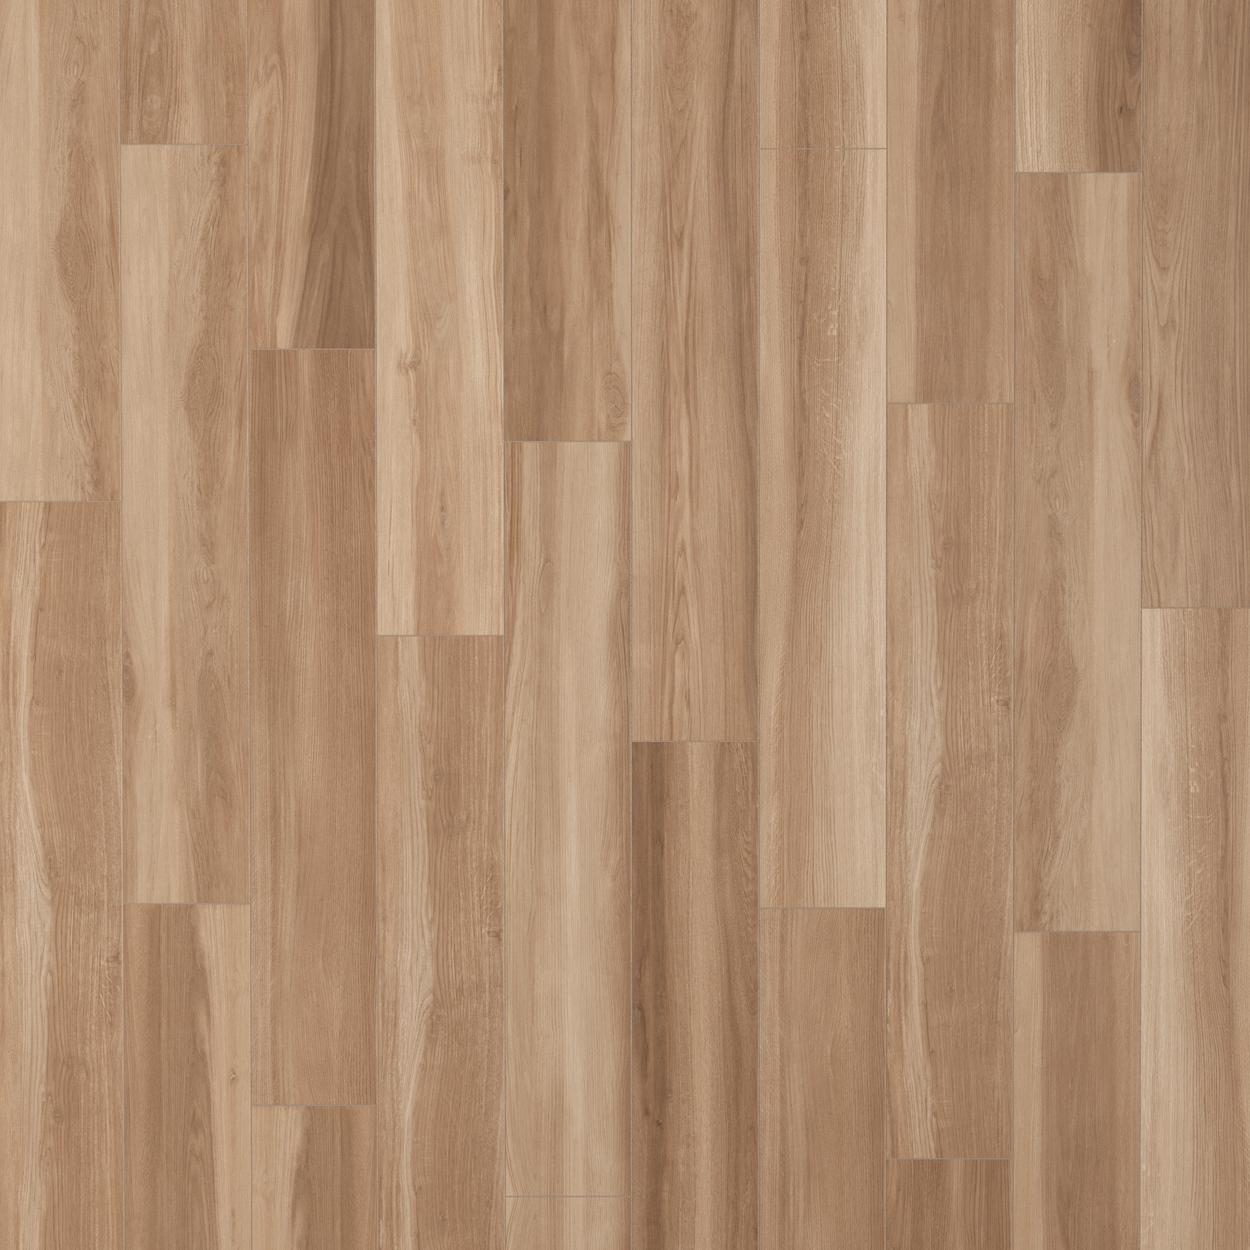 Wooden Elm Wood Look Tile